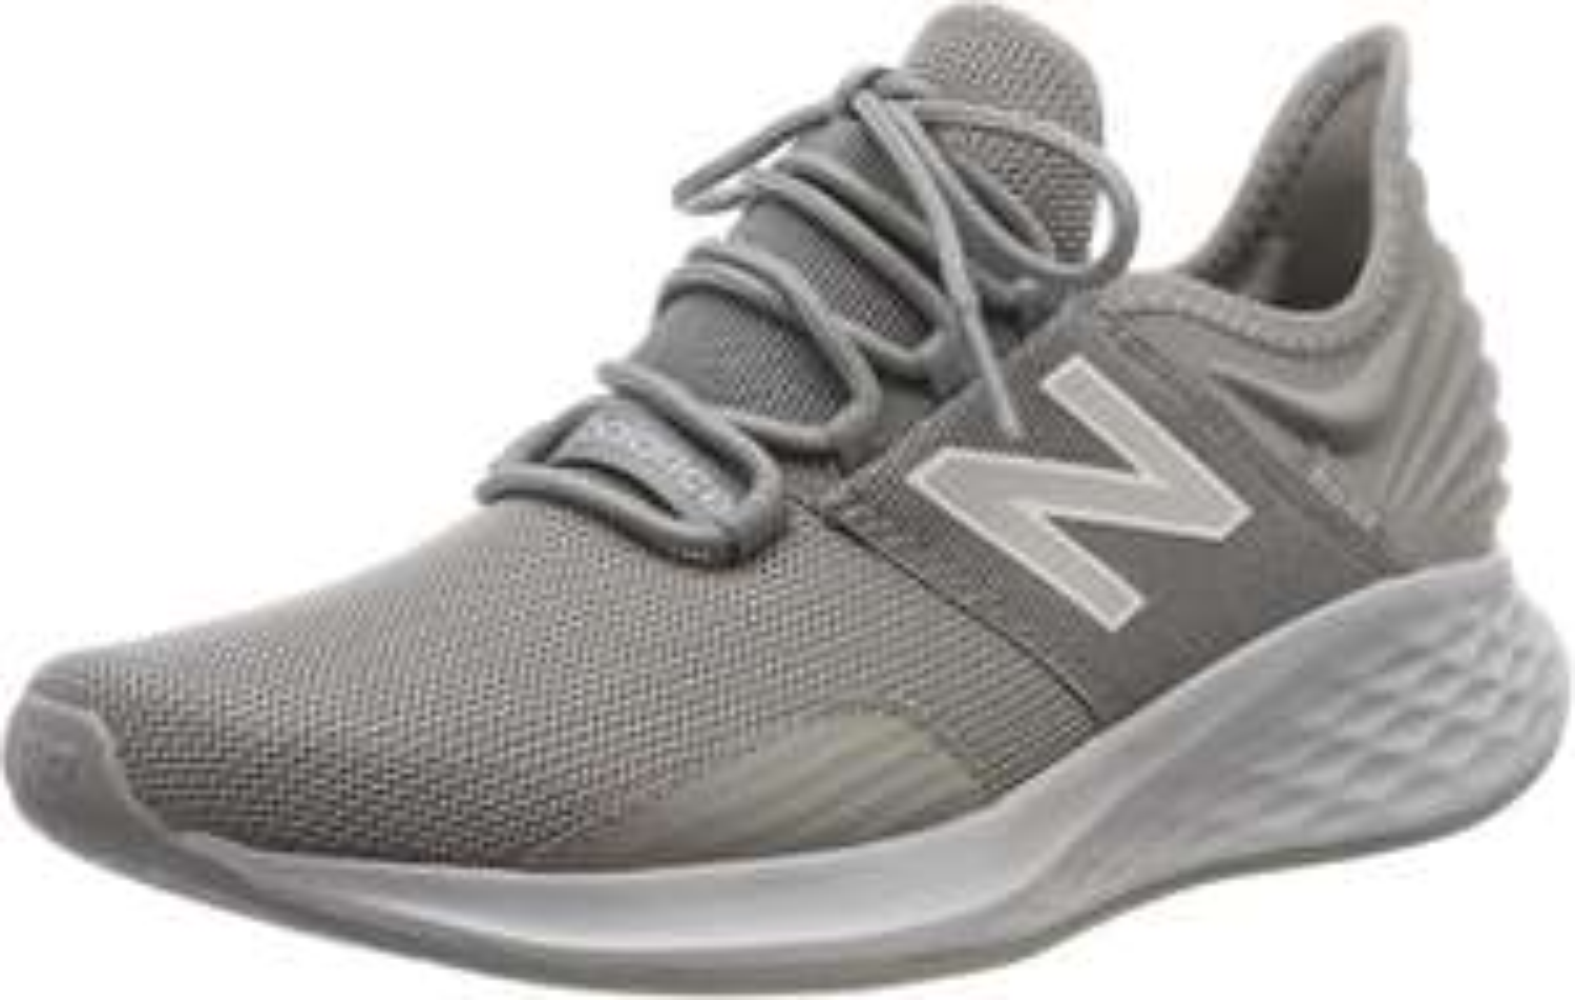 New Balance Men's Fresh Foam Roav Running Shoes (Size 7) £27.24 @ Amazon